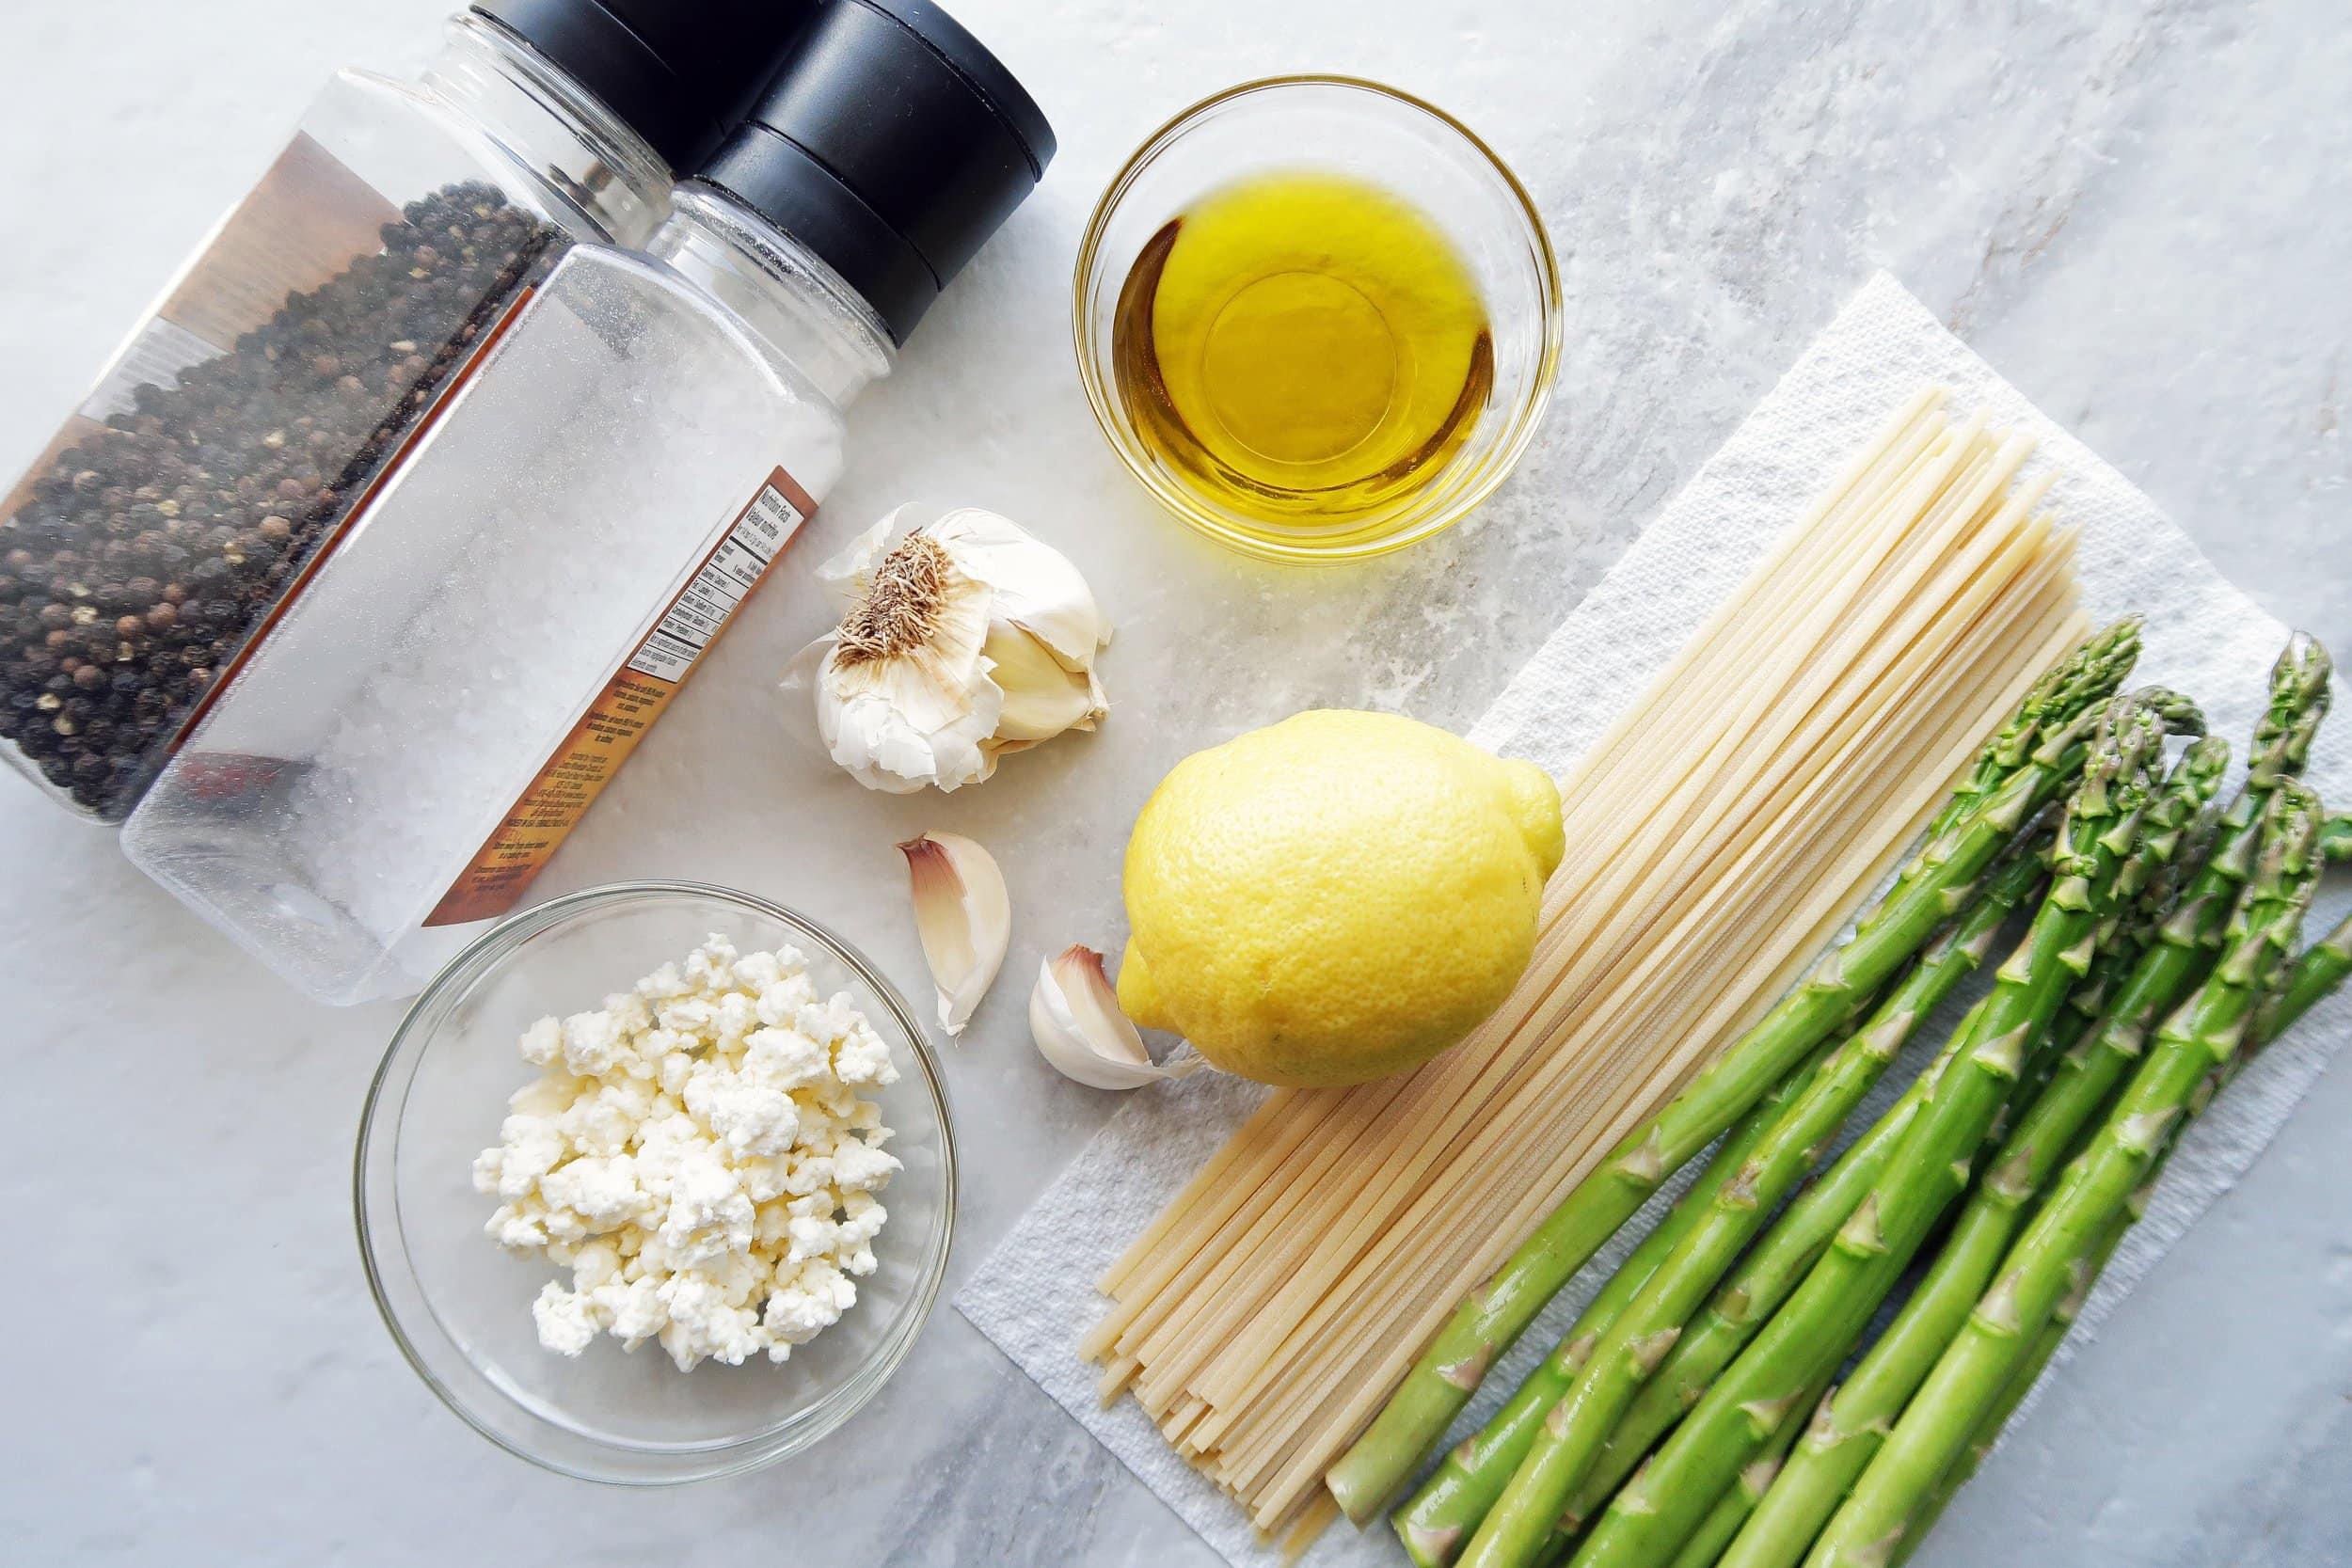 Linguine, feta, asparagus, garlic cloves, a lemon, salt and pepper shakers, and a bowl of olive oil.